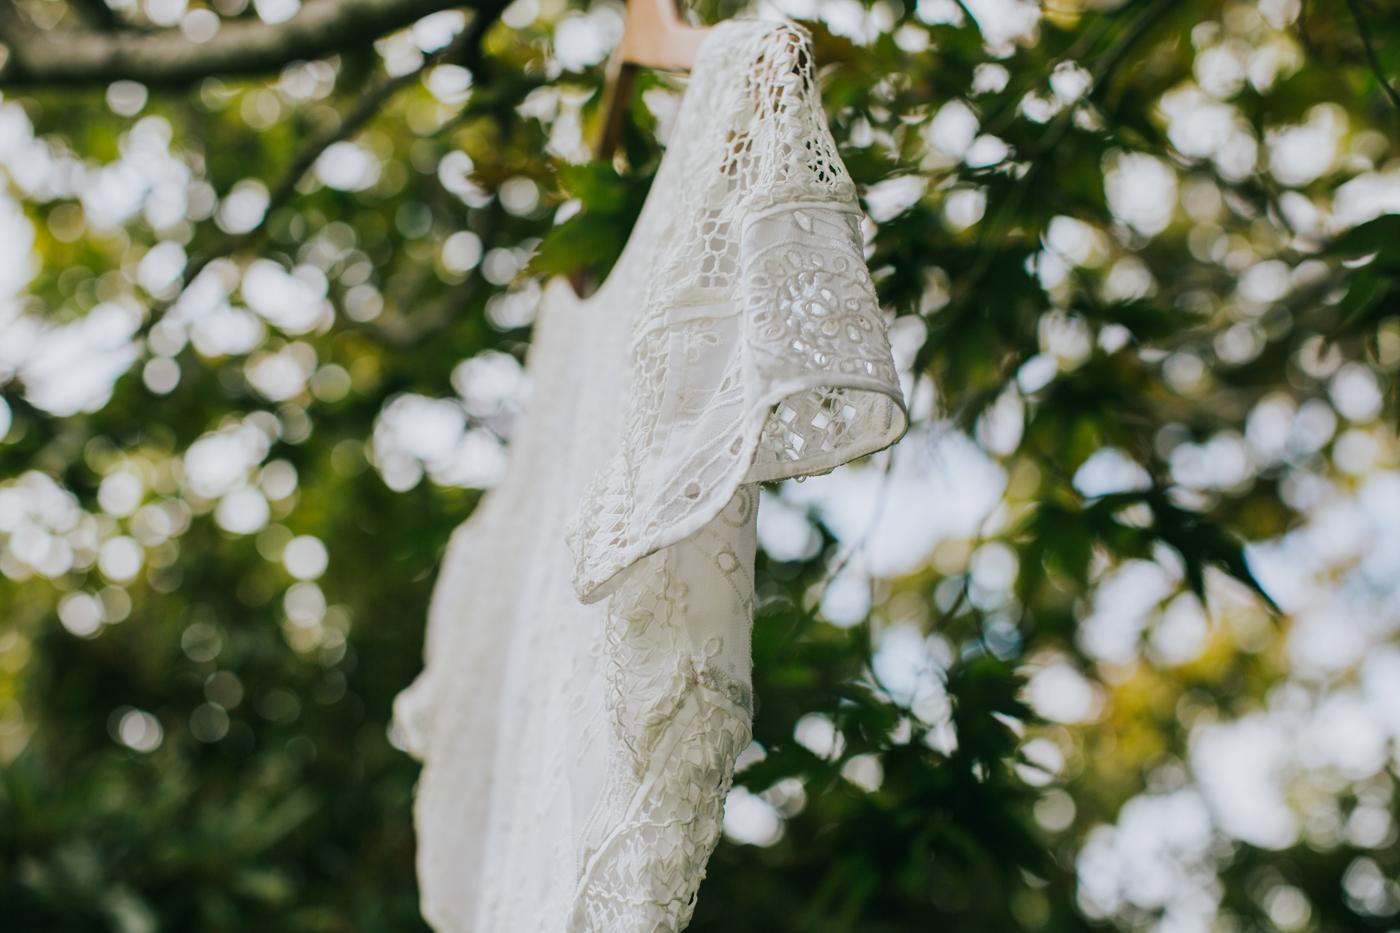 Ariana & Tim - Dunedin, New Zealand Wedding - Destination Wedding - Samantha Heather Photography-27.jpg